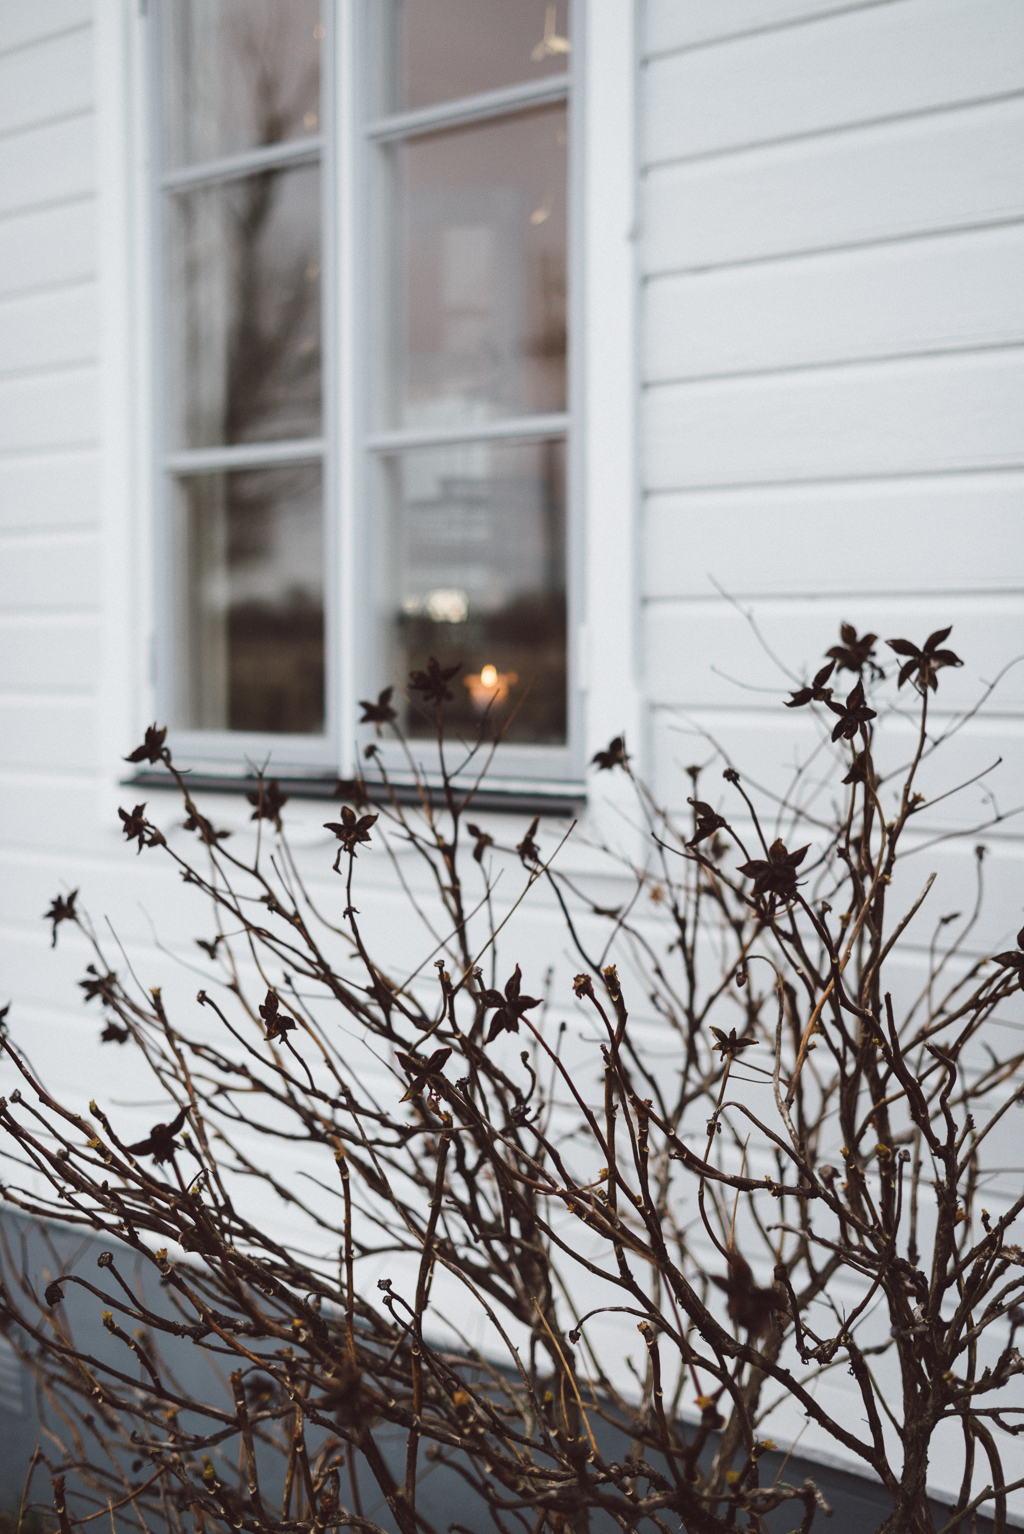 Babes_in_Boyland_Gotland_Foto_Matilda-Hildingsson_Stylist_Nathalie-Myrberg-37